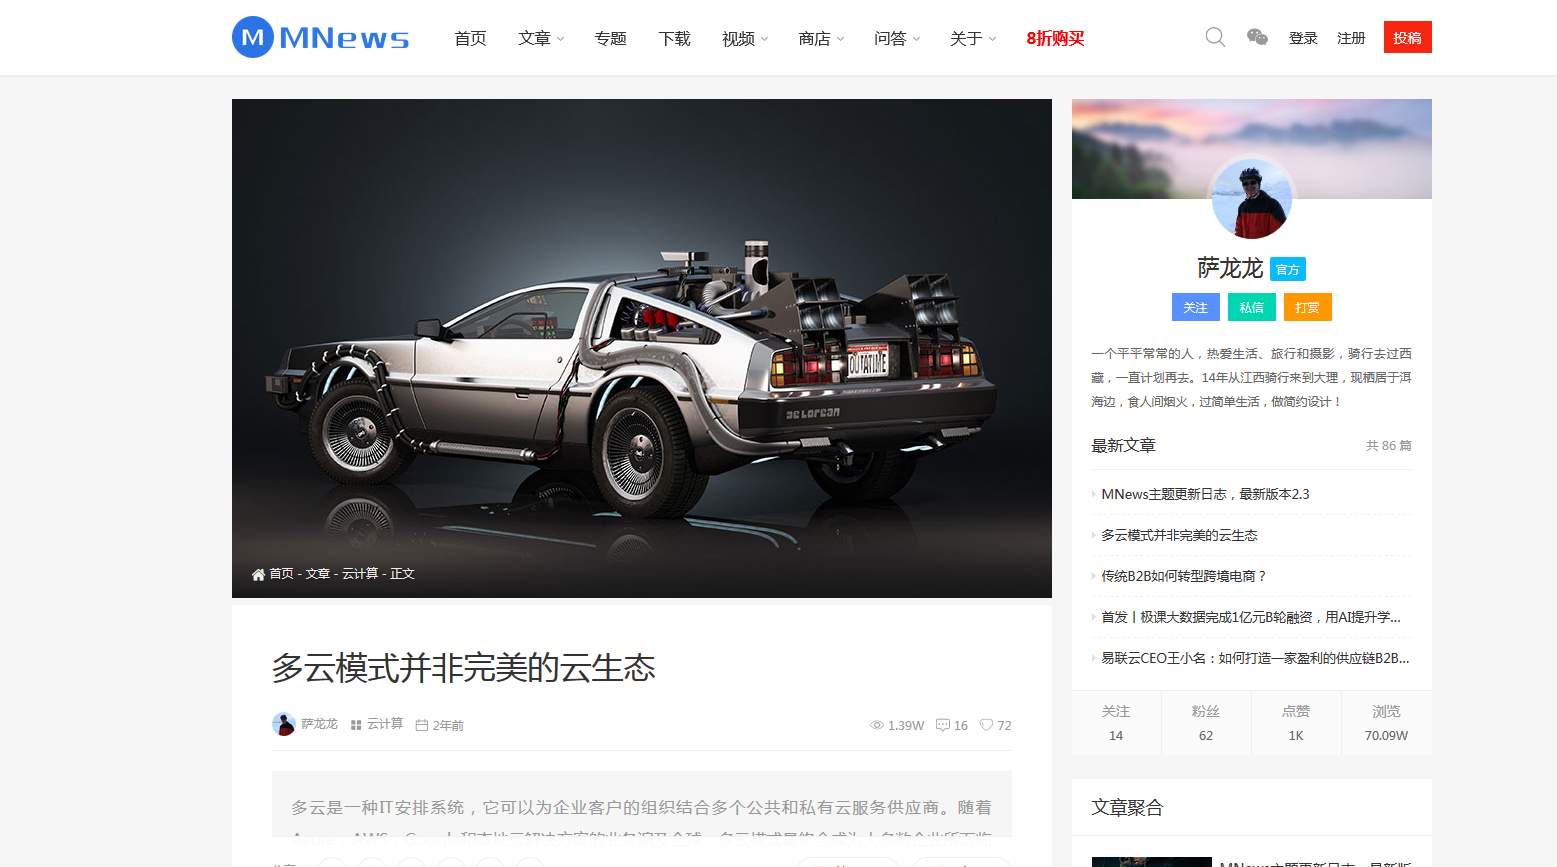 WordPress萨龙MNews1.9新闻自媒体主题免费下载